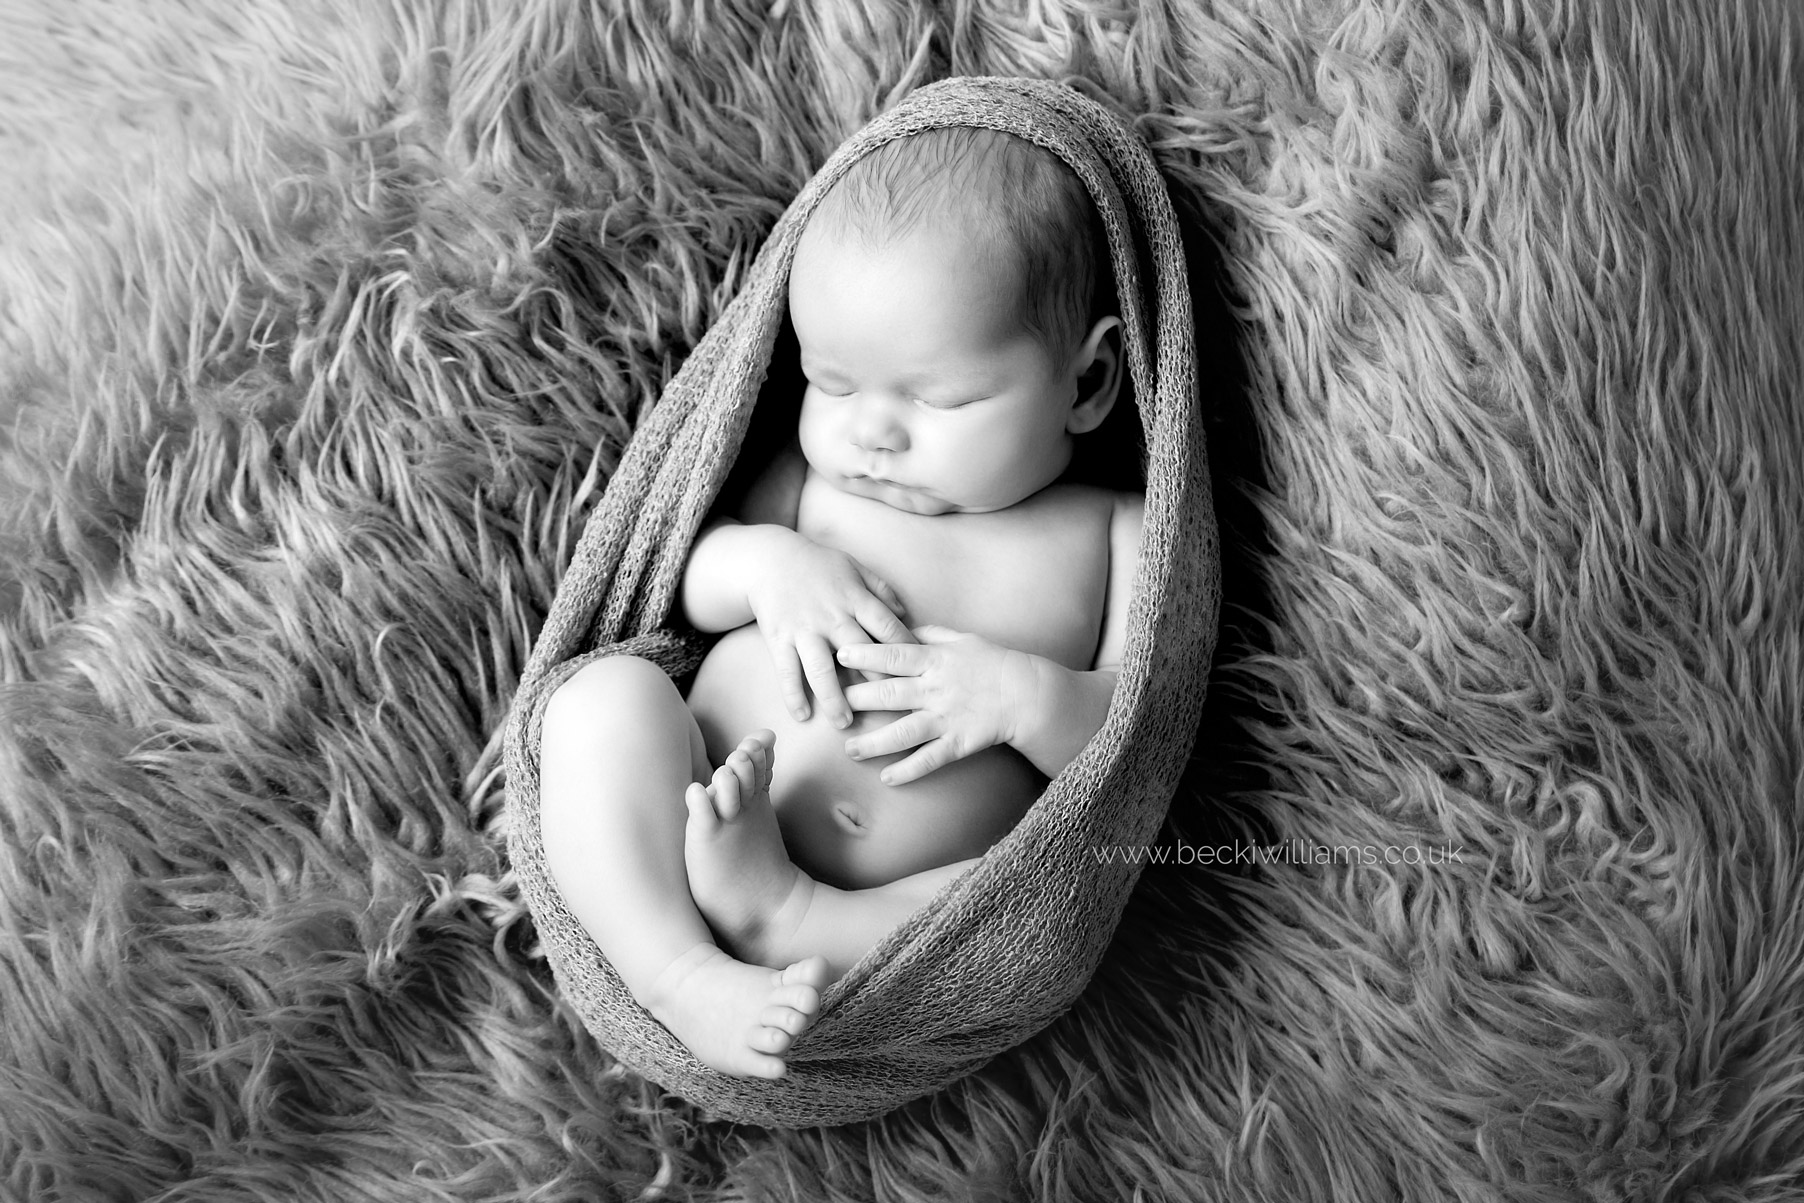 Hertfordshire-photographer-newborn-boy-asleep-cute-black-and-white.jpg